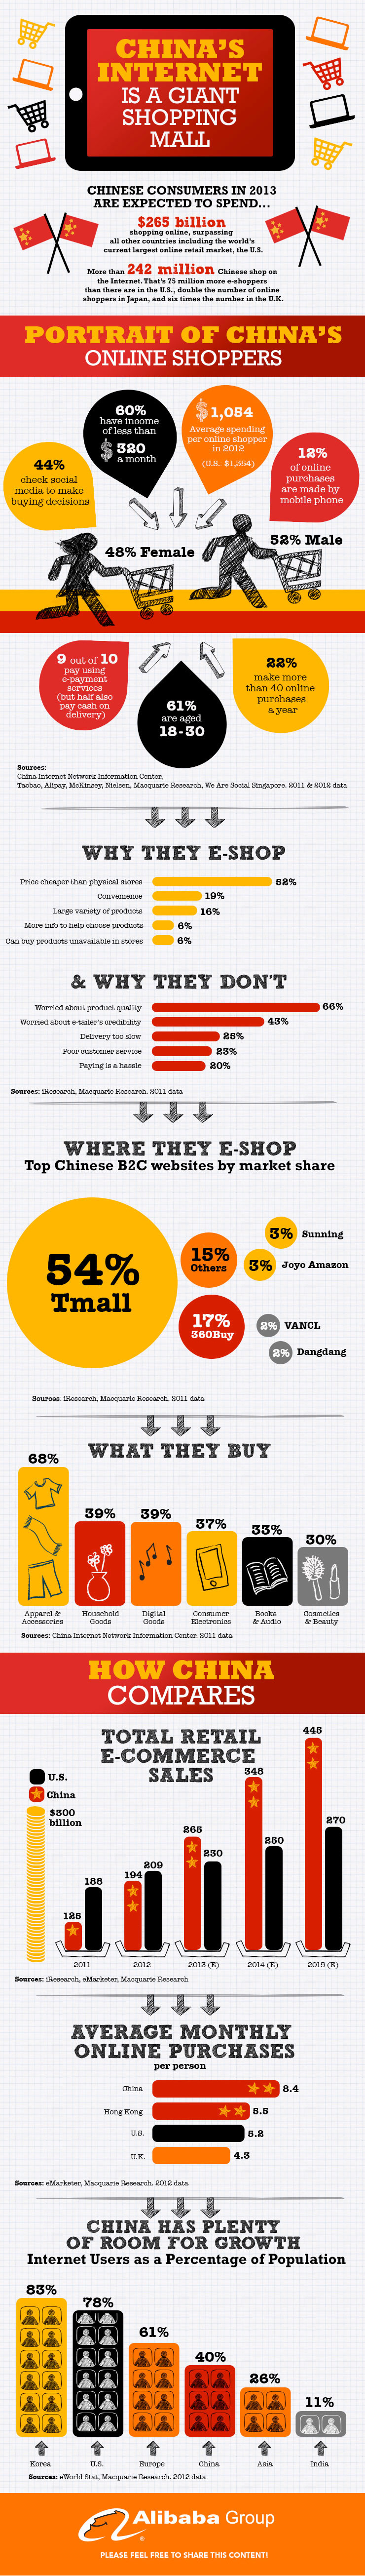 china_online_shopping-infographic.jpg